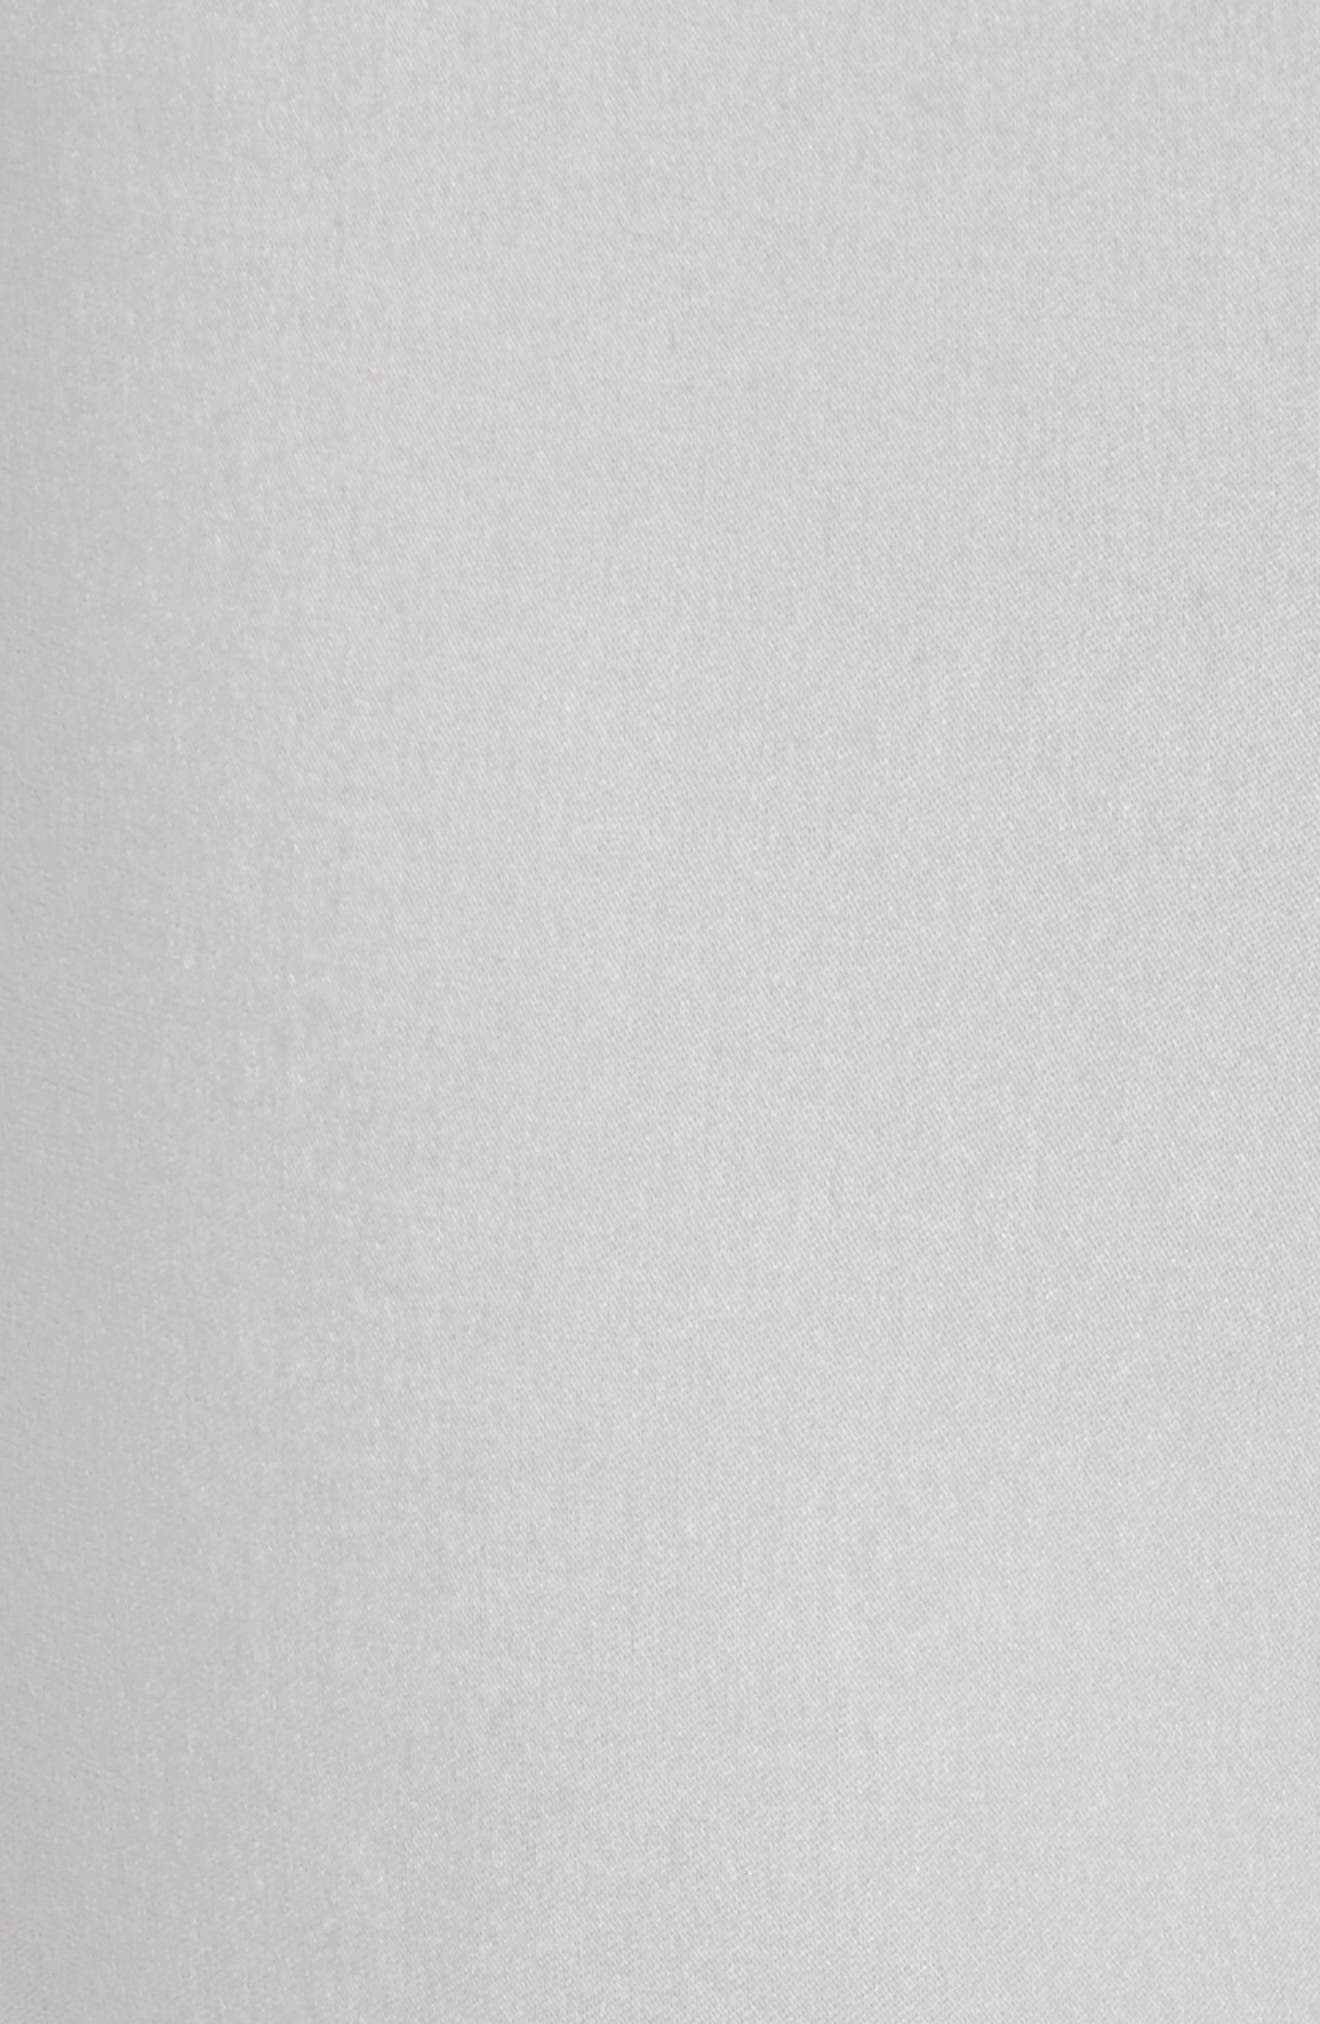 NIC + ZOE Wonderstretch Slim Pants,                             Alternate thumbnail 6, color,                             050